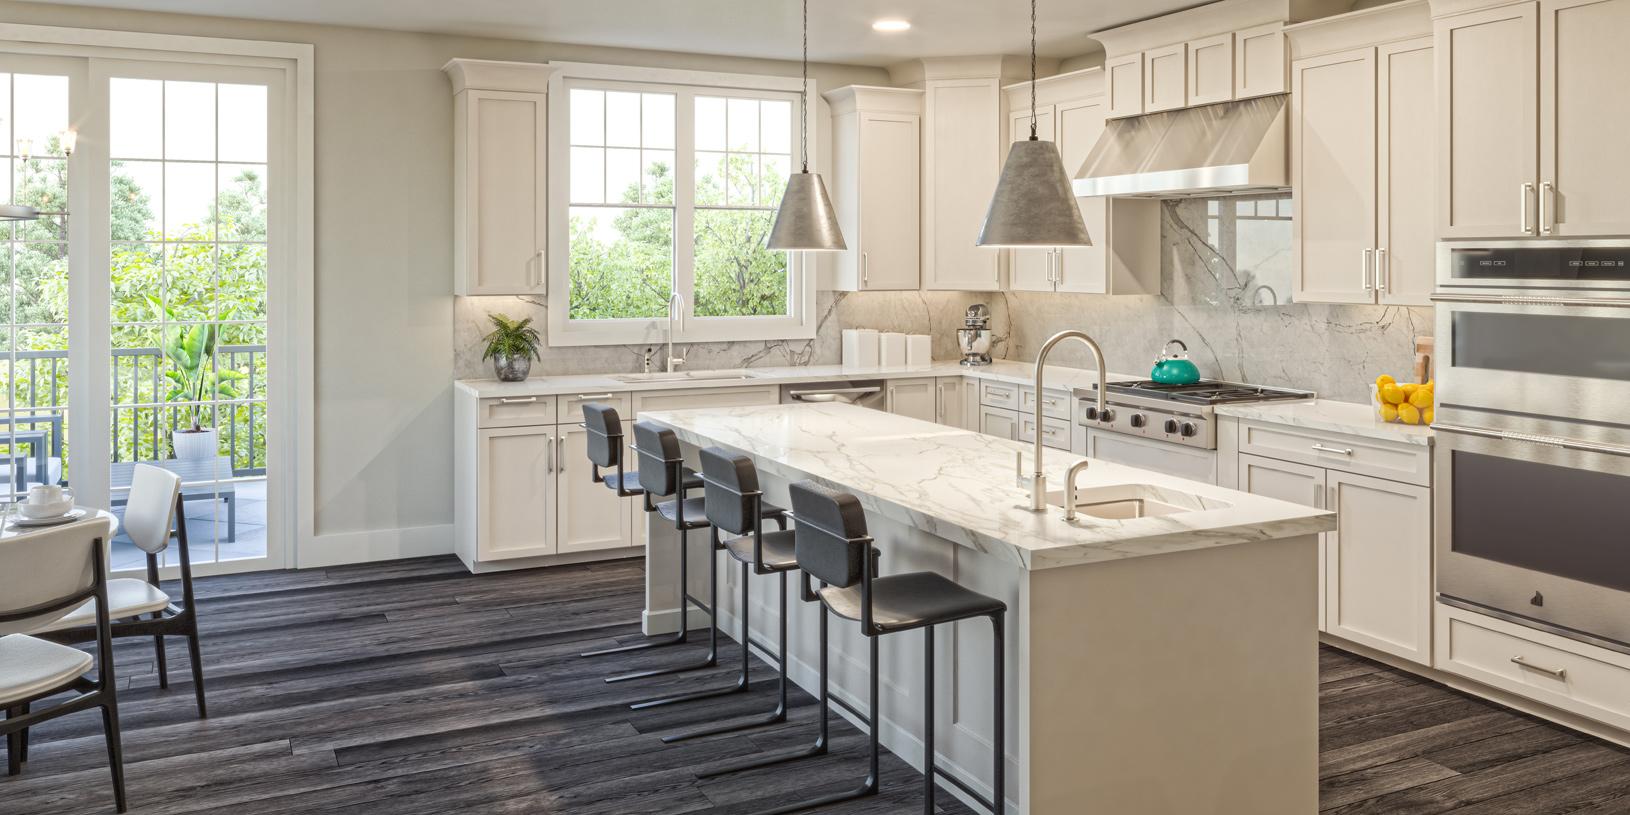 The spacious Carlough kitchen